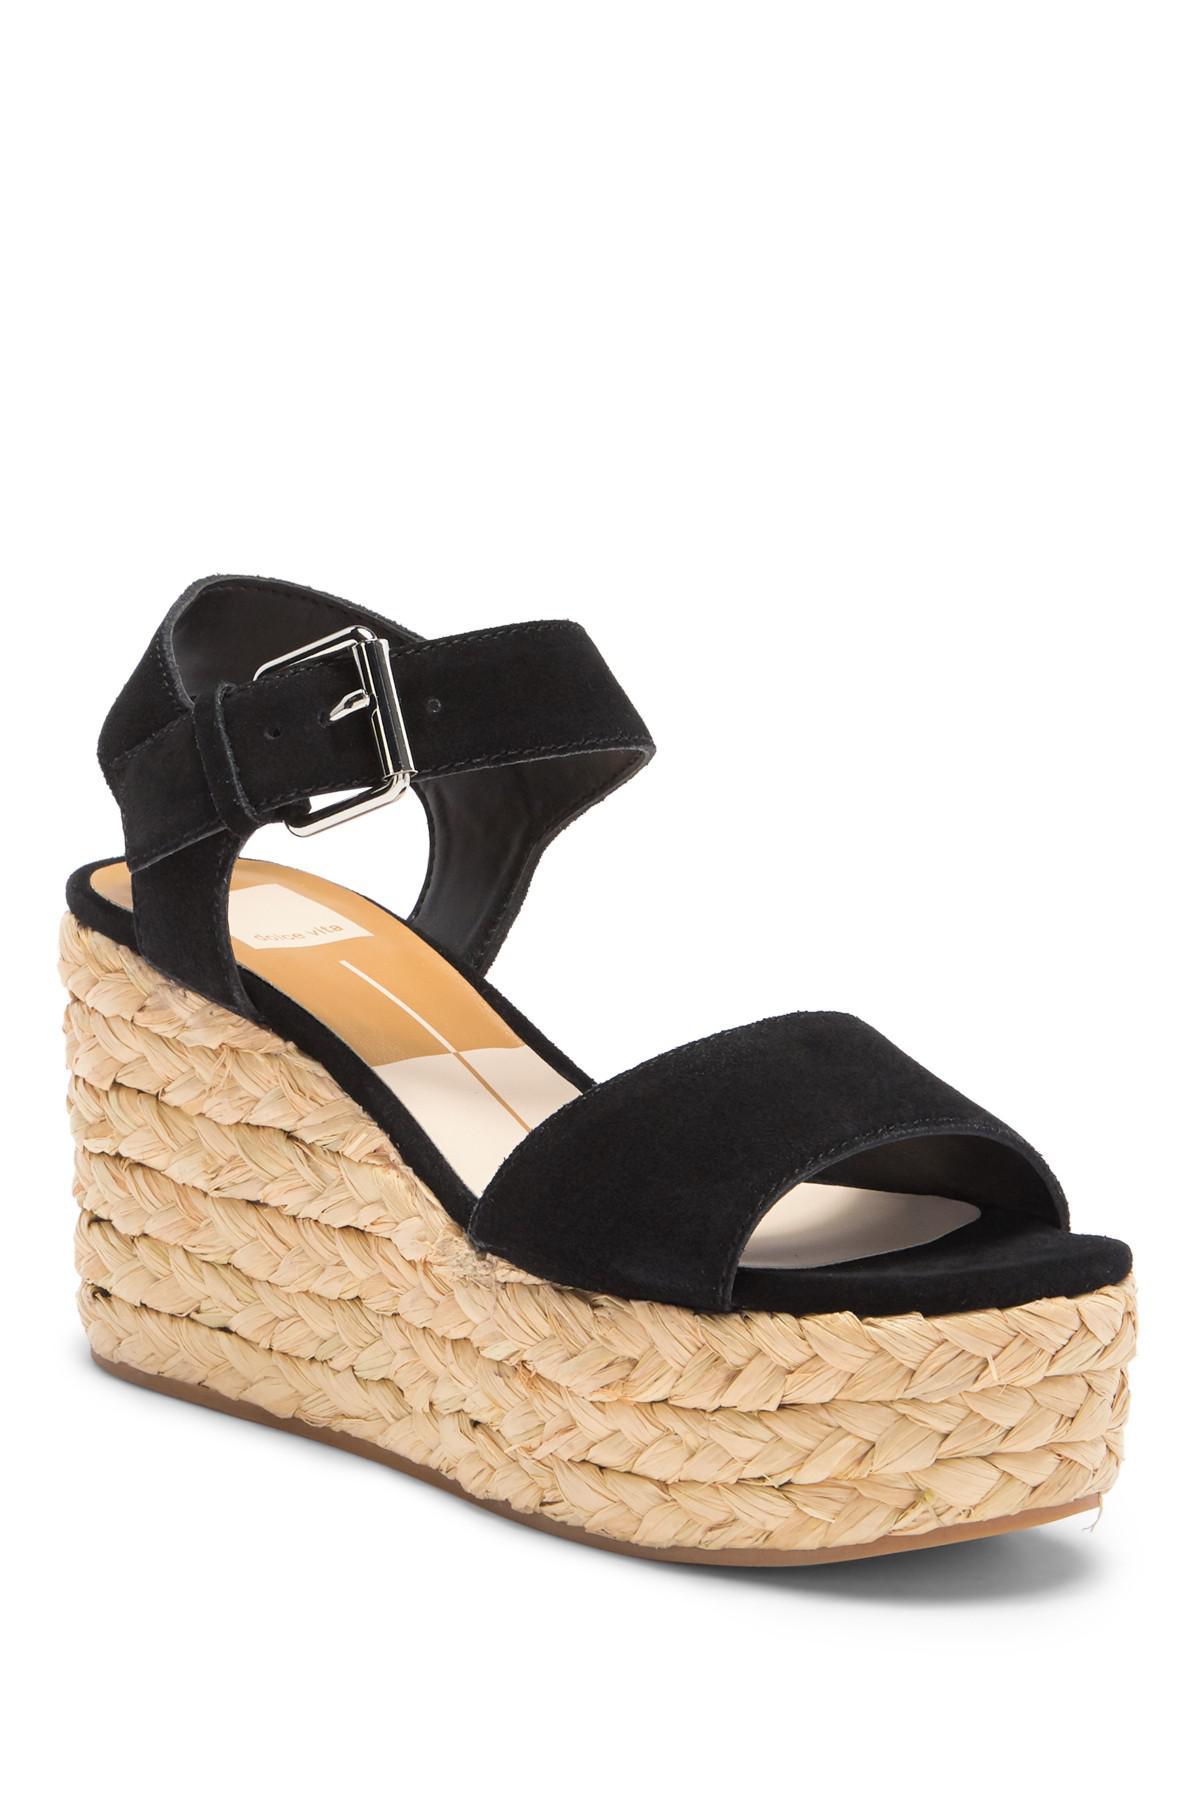 2d353942228 Dolce Vita Sacha Platform Wedge Sandal in Black - Lyst